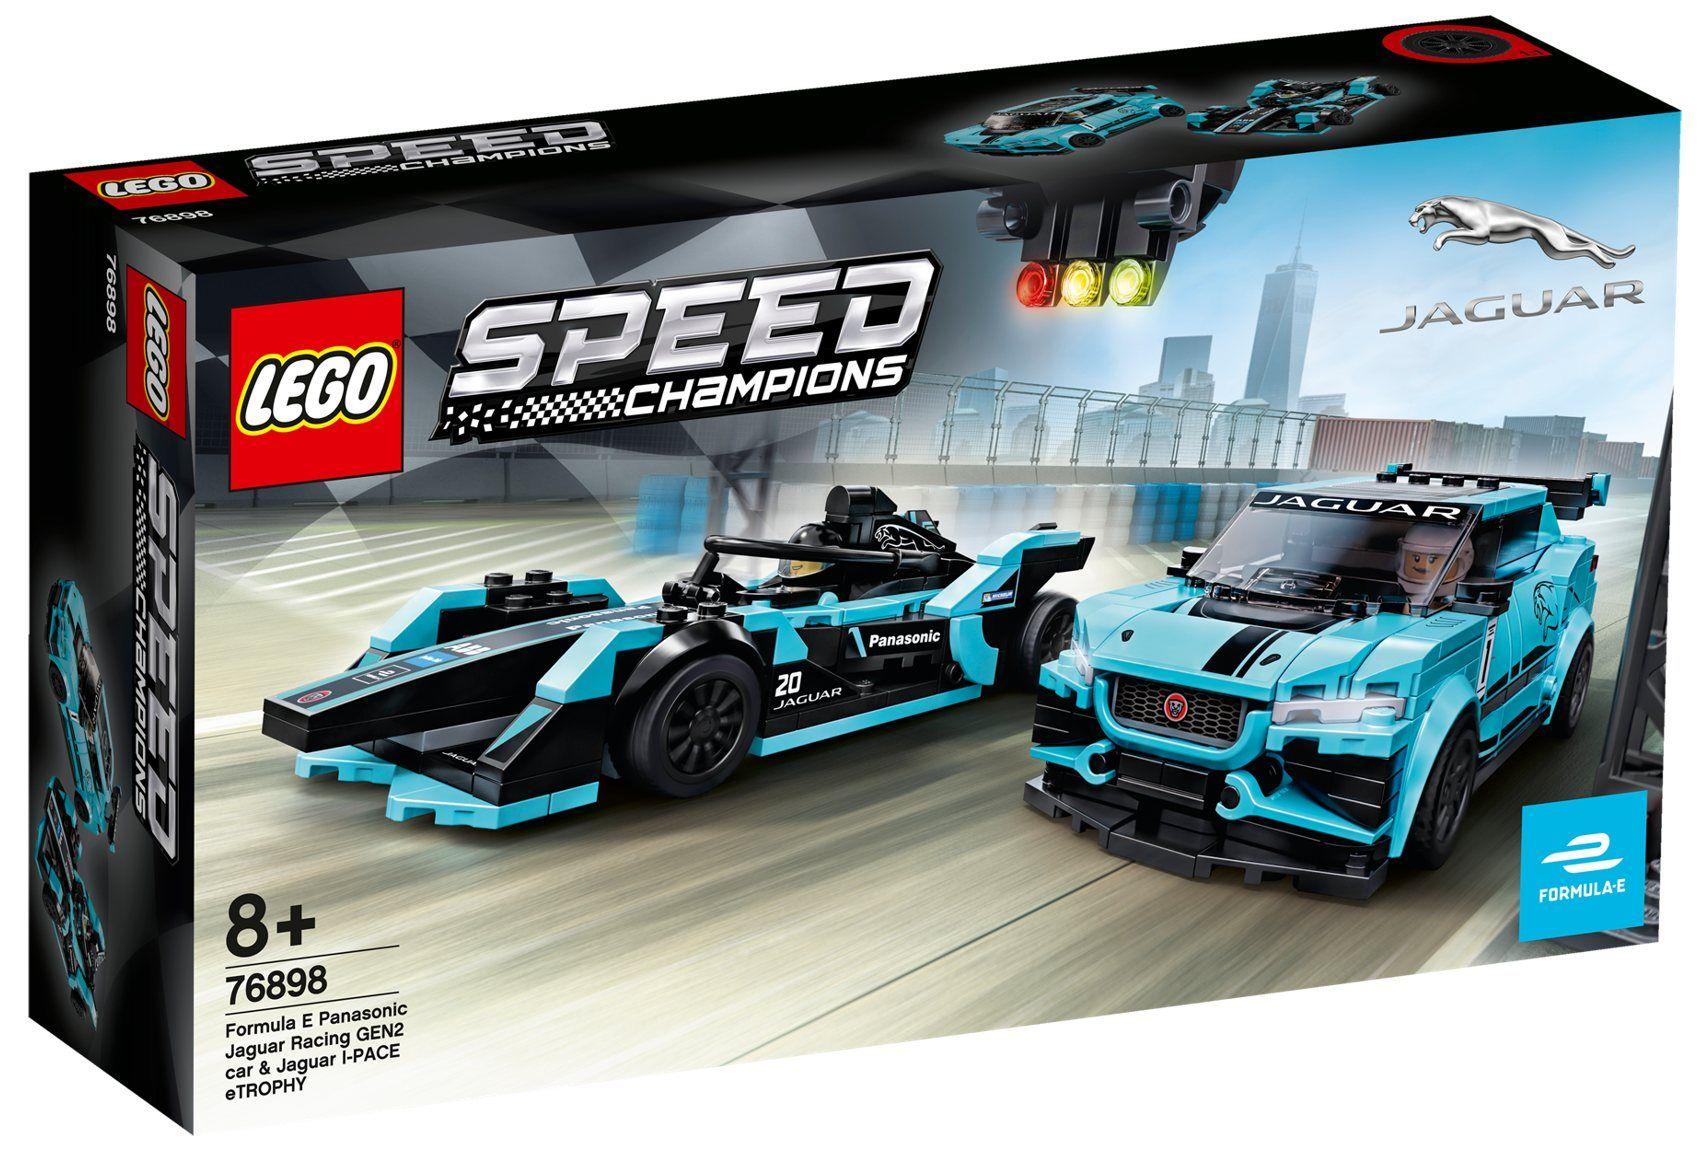 LEGO 76898 Speed Champions - Formula E Panasonic Jaguar Racing GEN2 car i Jaguar I-PACE eTROPHY